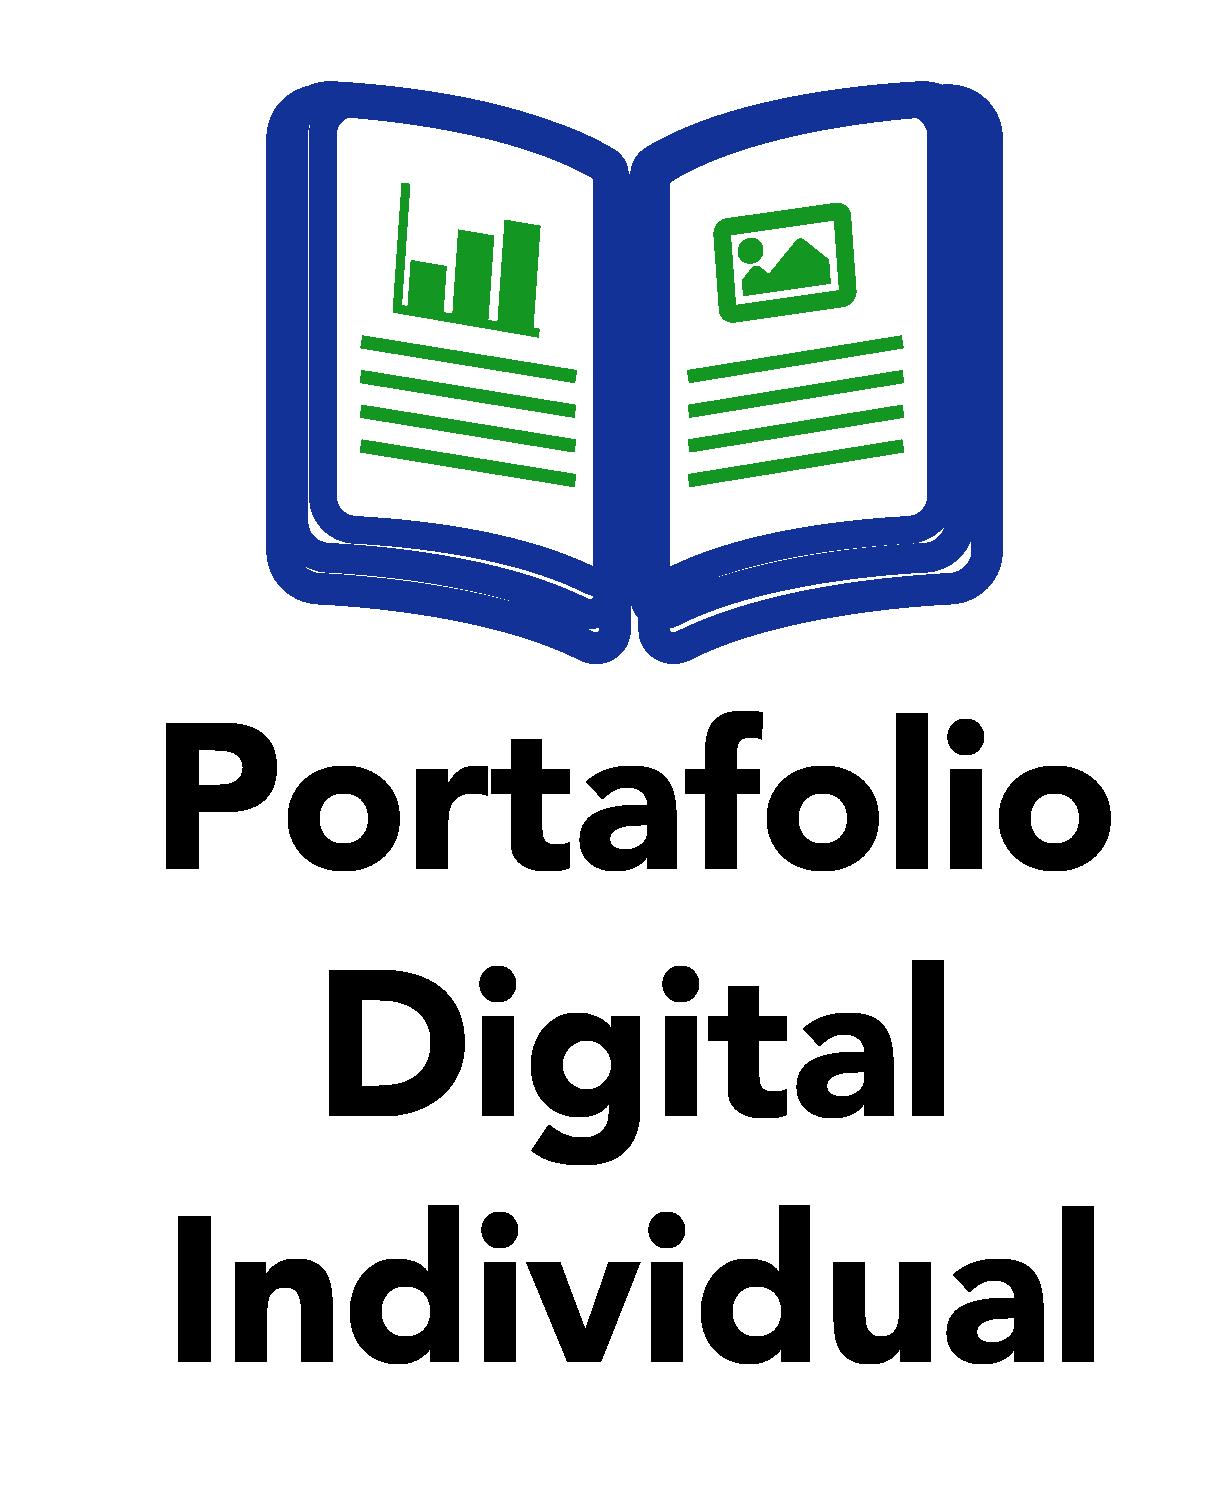 Machtiani, sistema de desarrollo y aprendizaje, portafolio digital individual